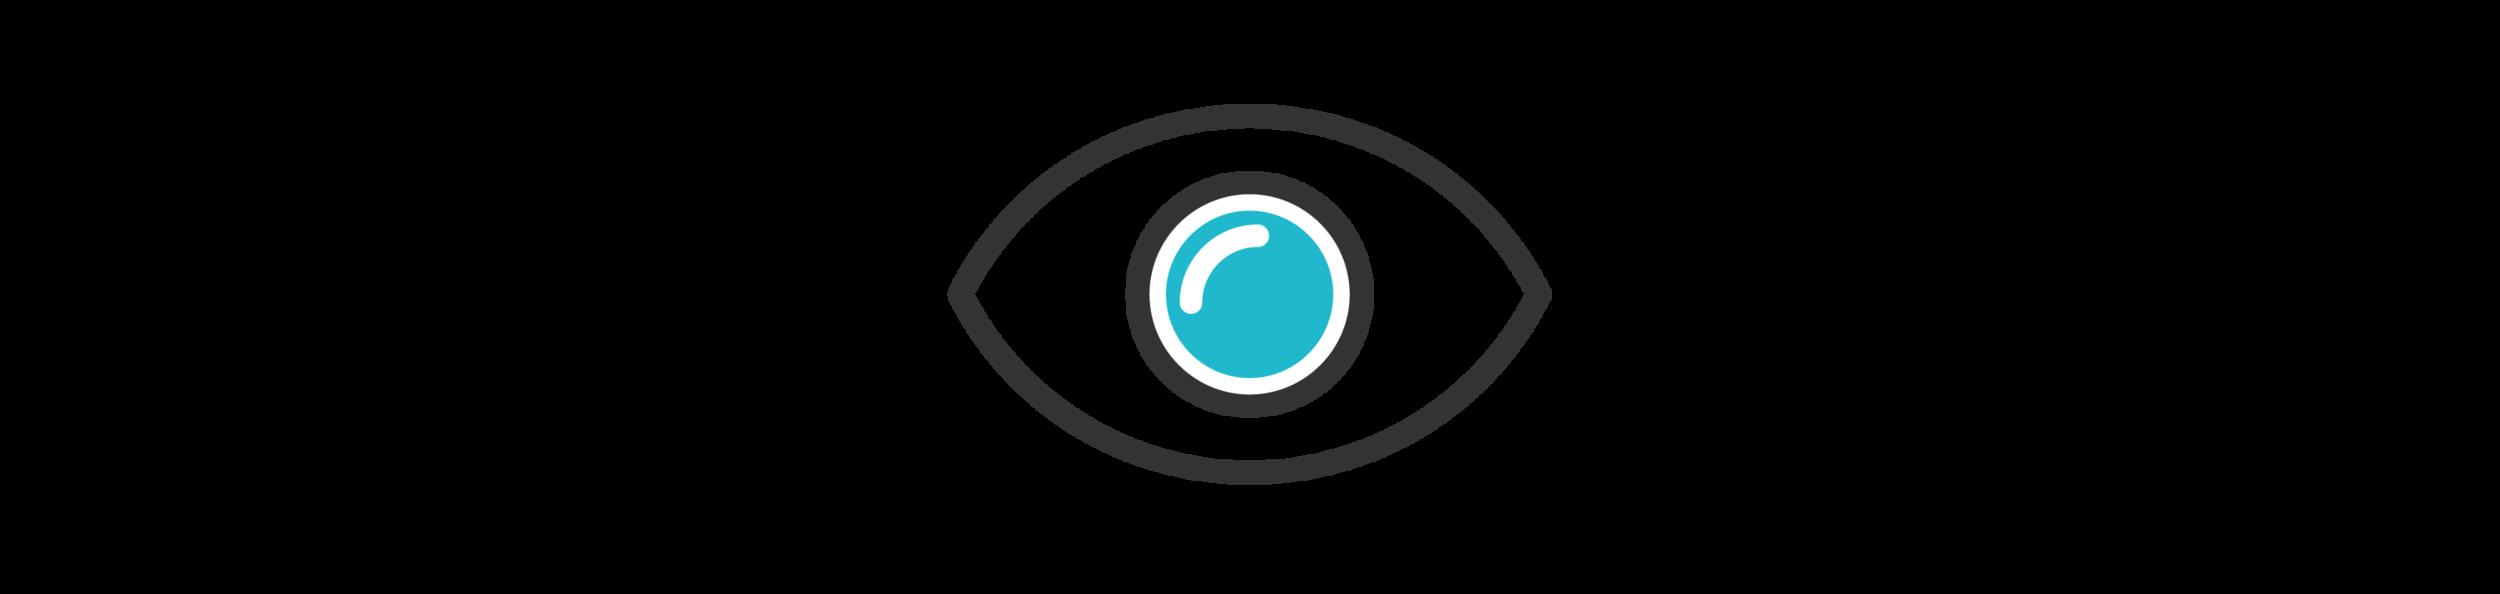 icon-Visualization-multi.png